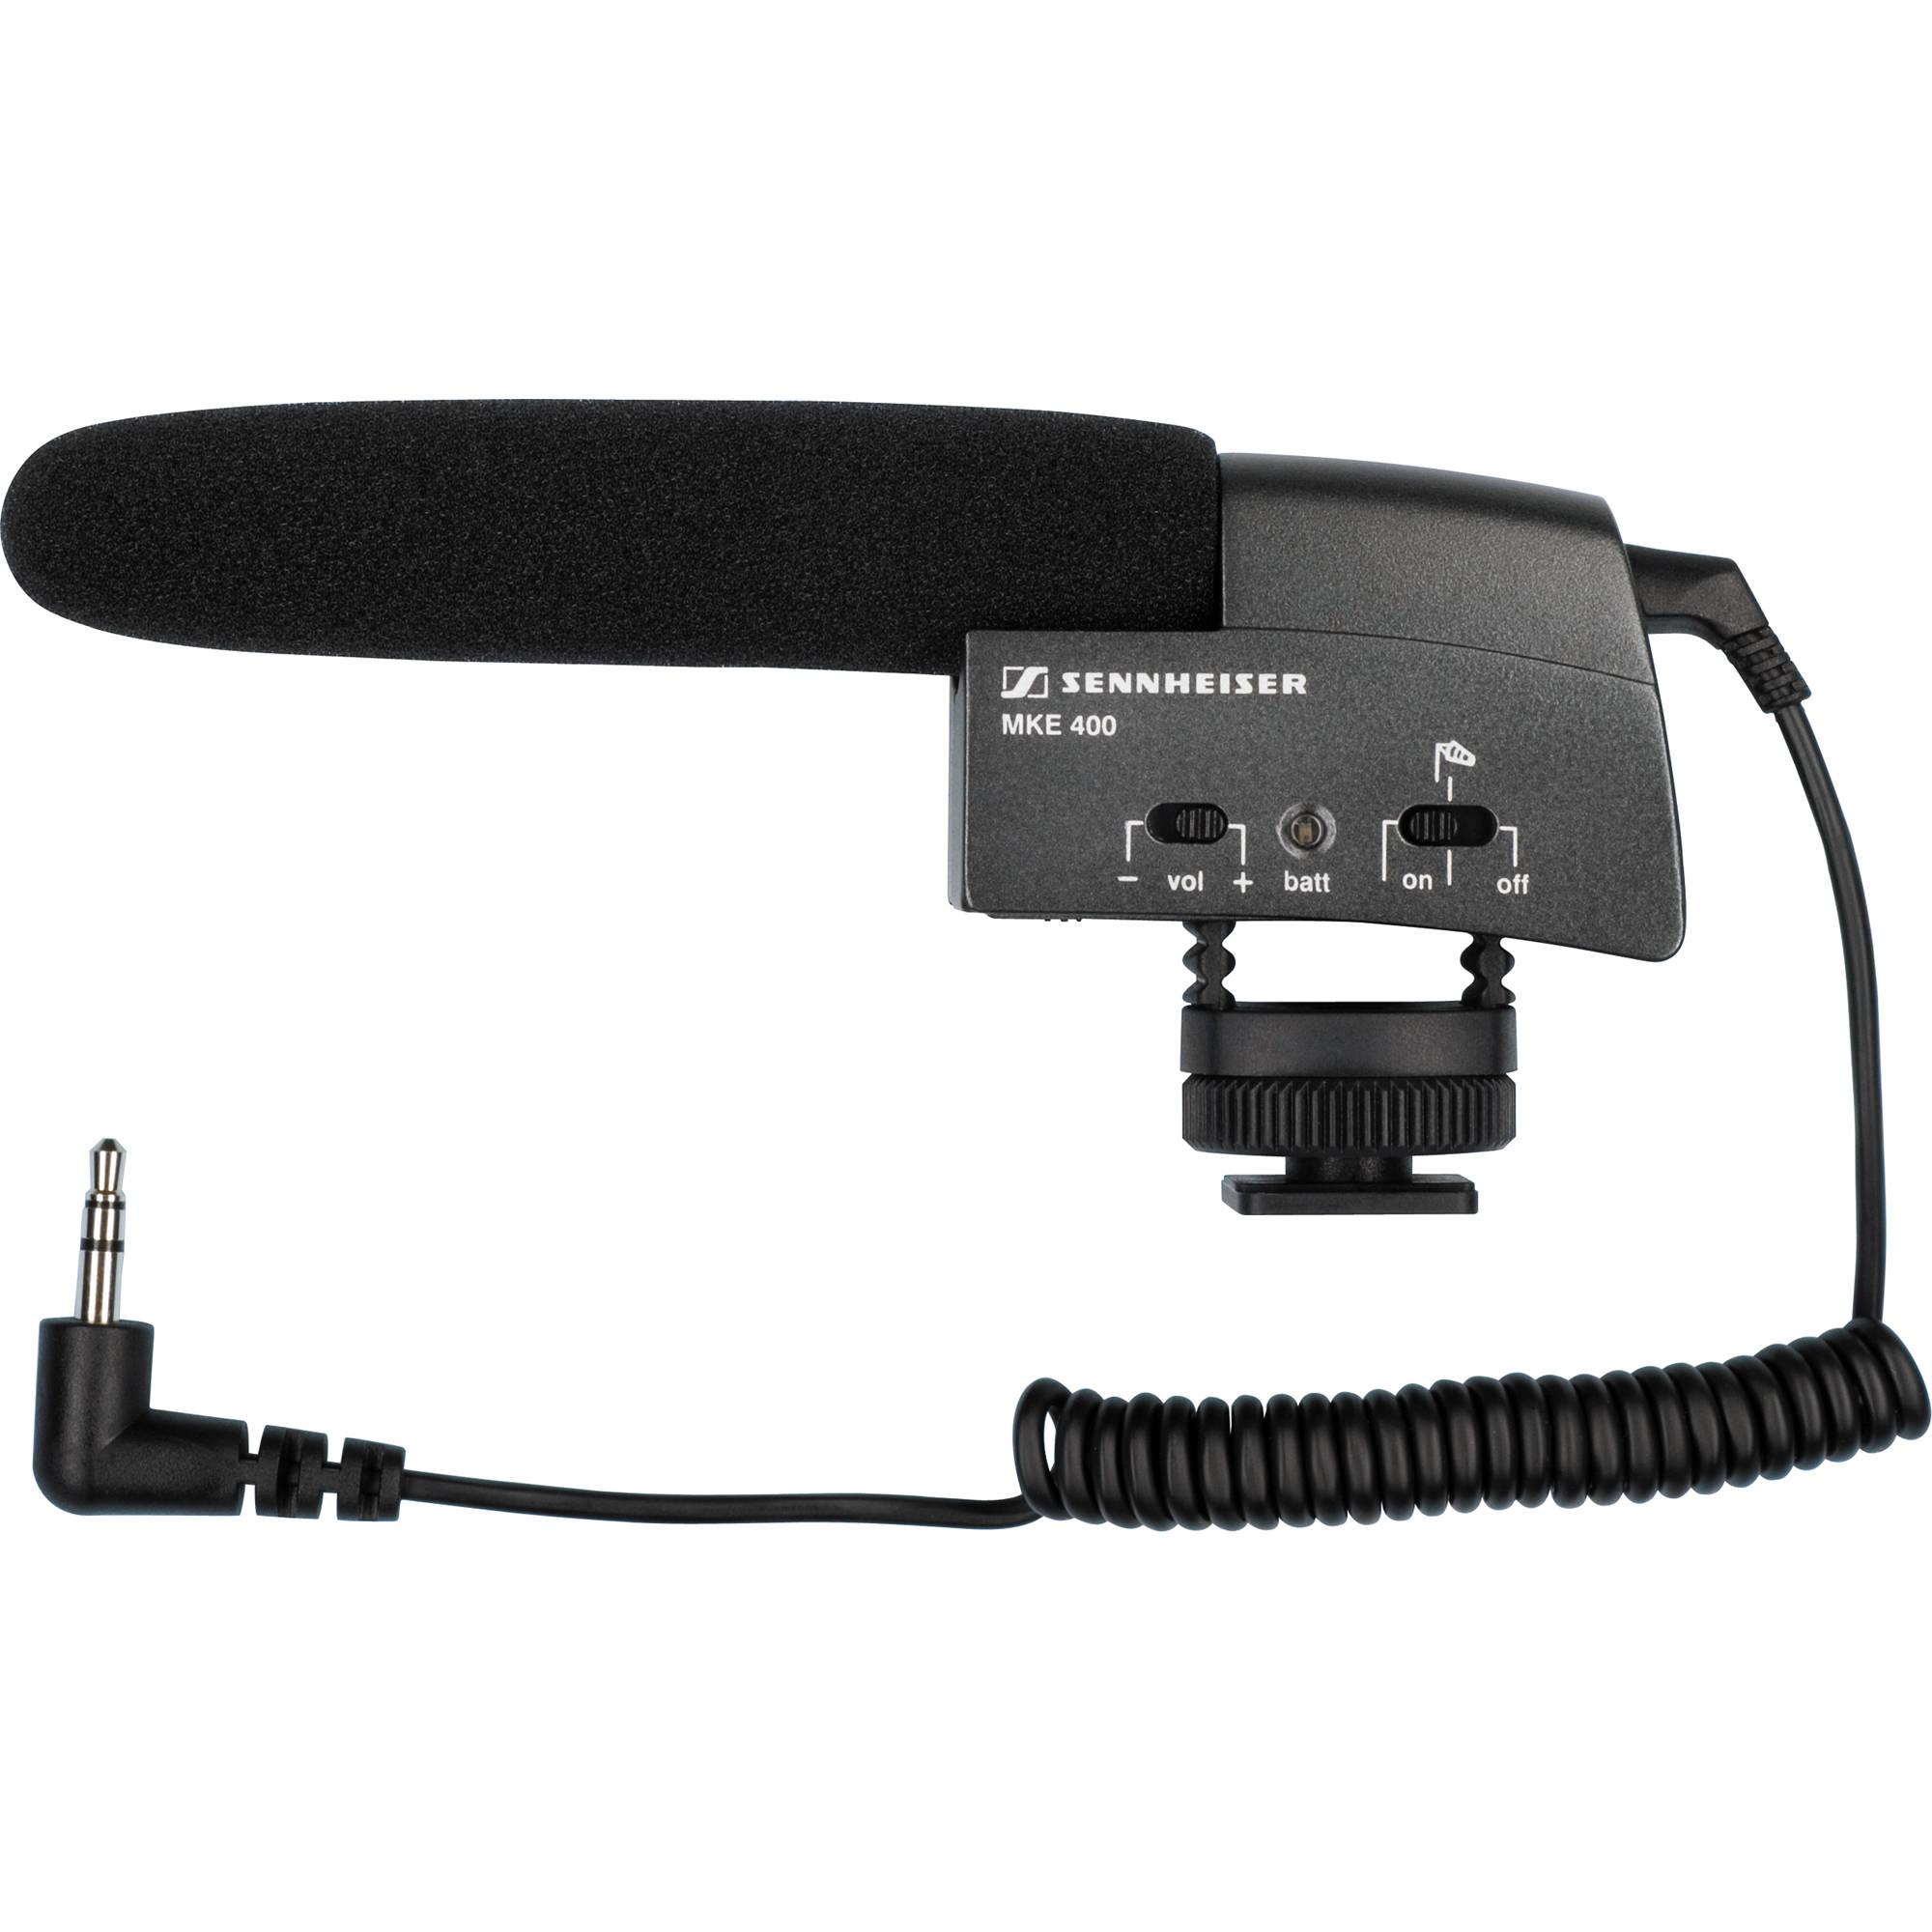 Sennheiser Mke 400 Compact Video Camera Shotgun Microphone Ecm Mic Preamplifier By Bc549